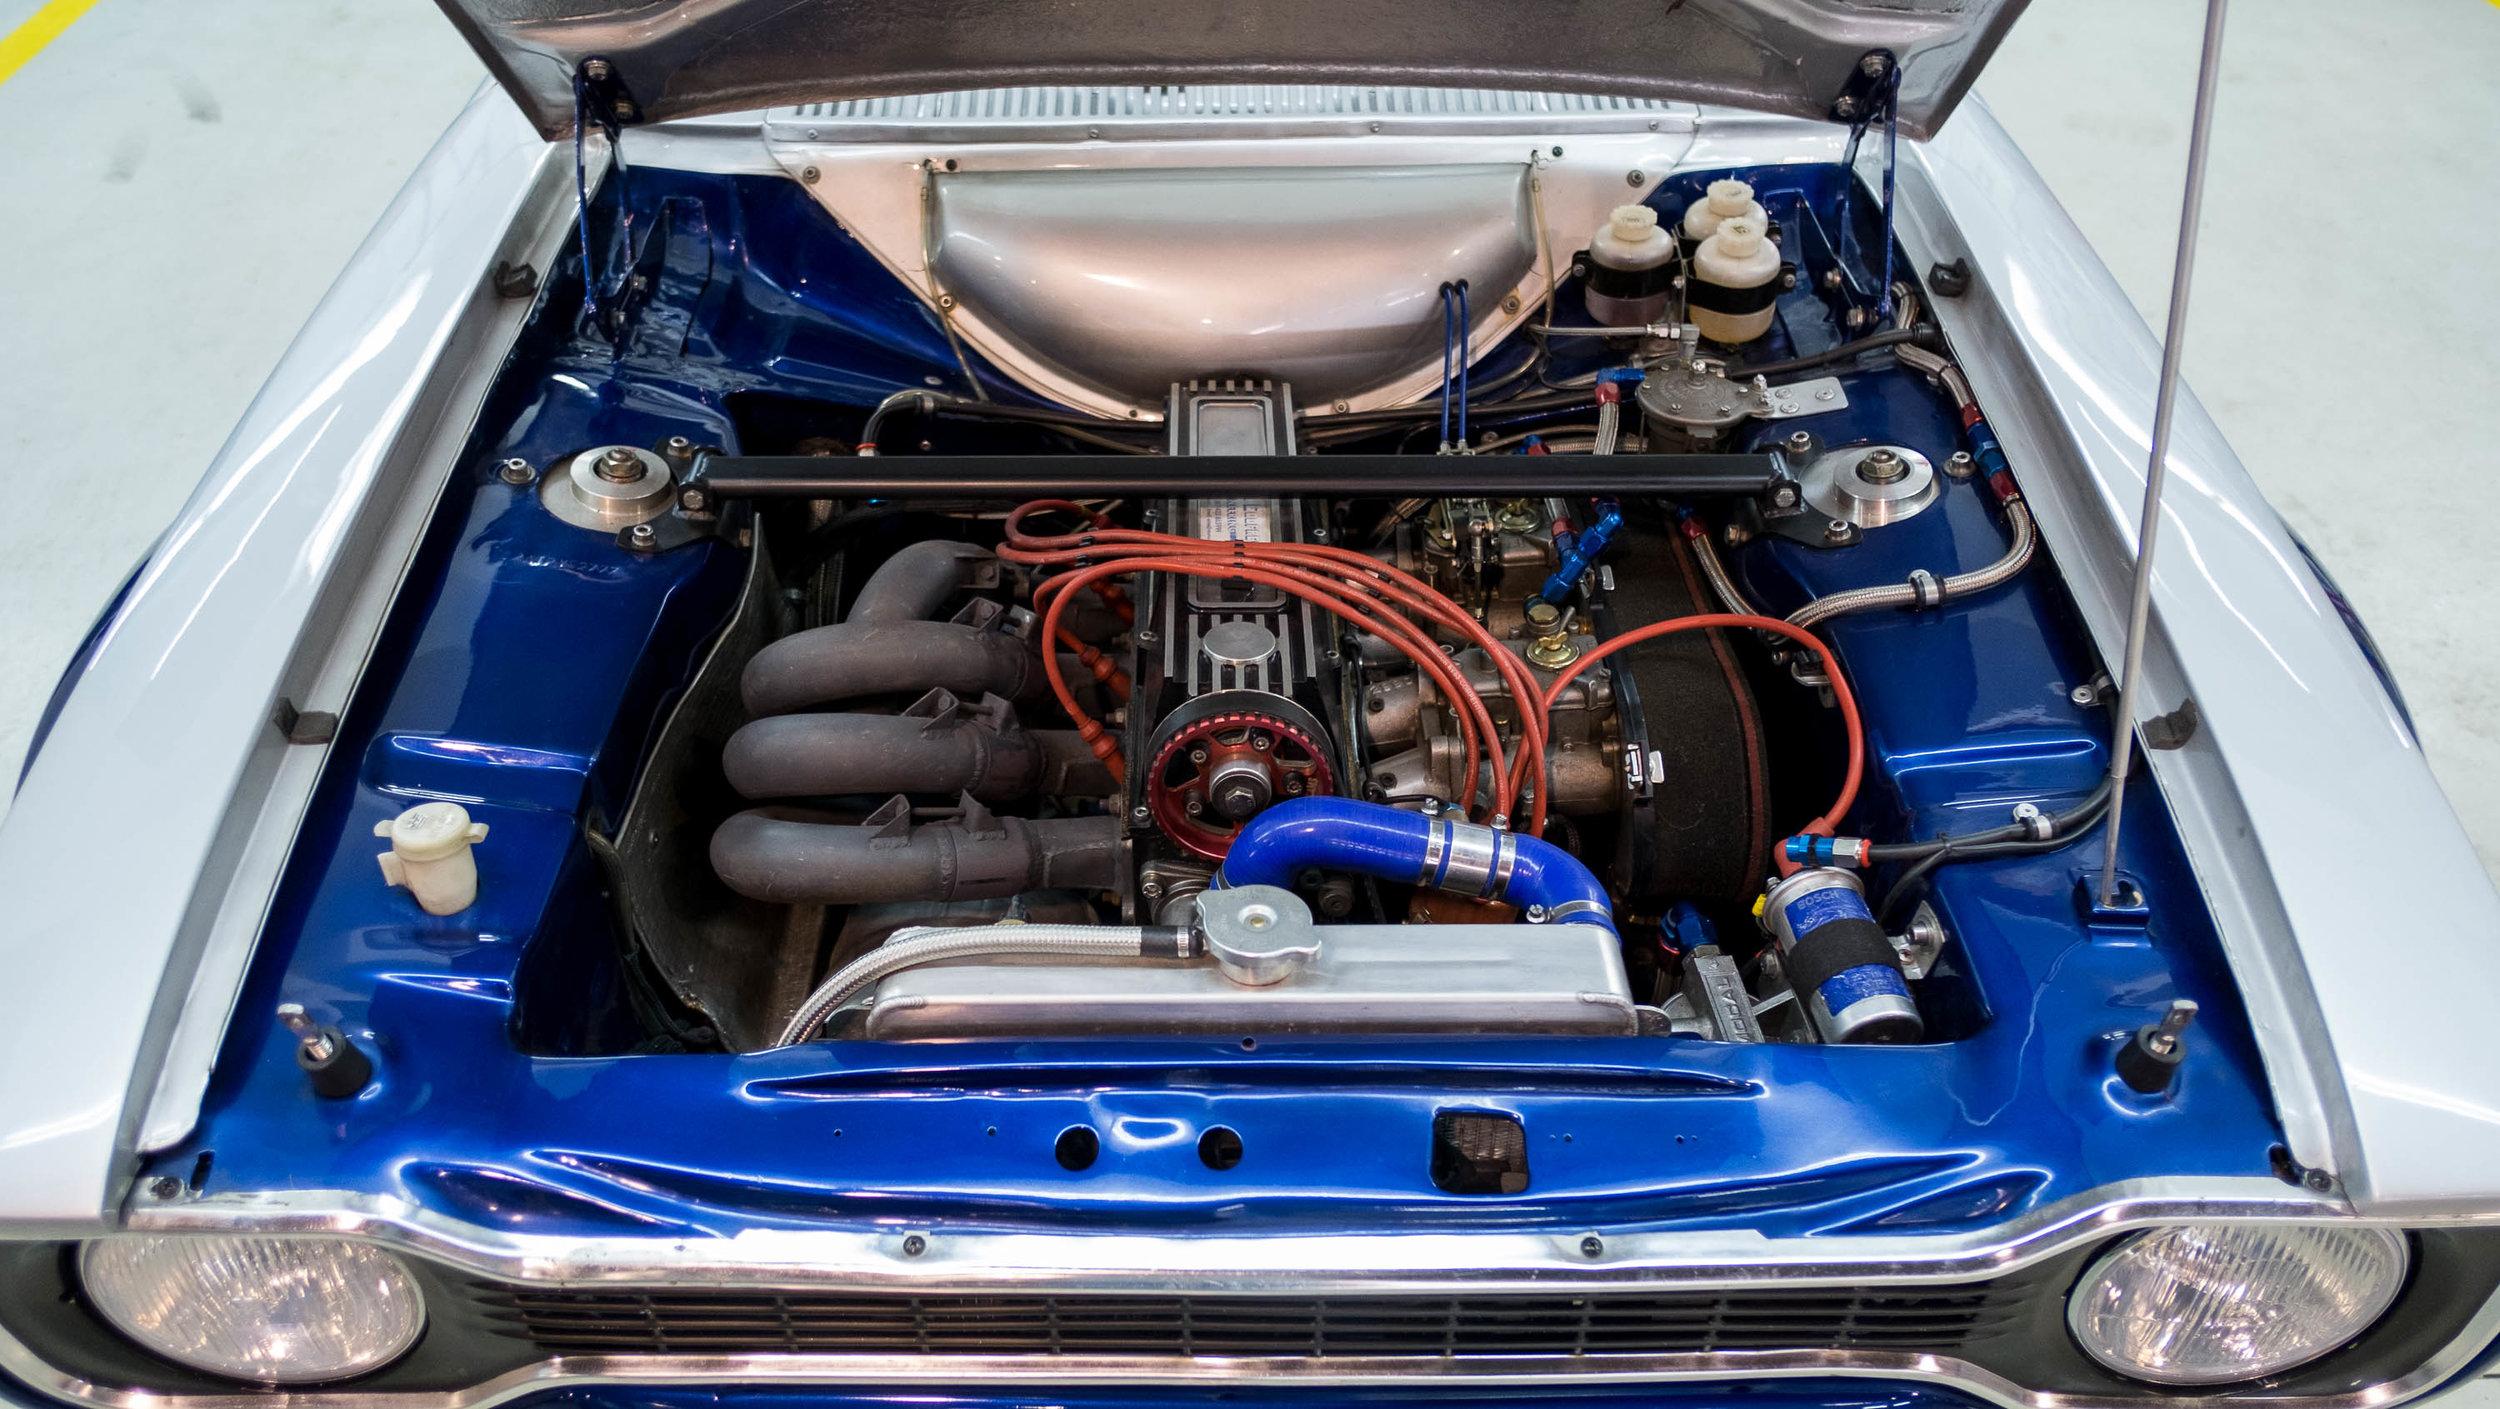 coolnvintage Ford Escort MKI (44 of 87).jpg